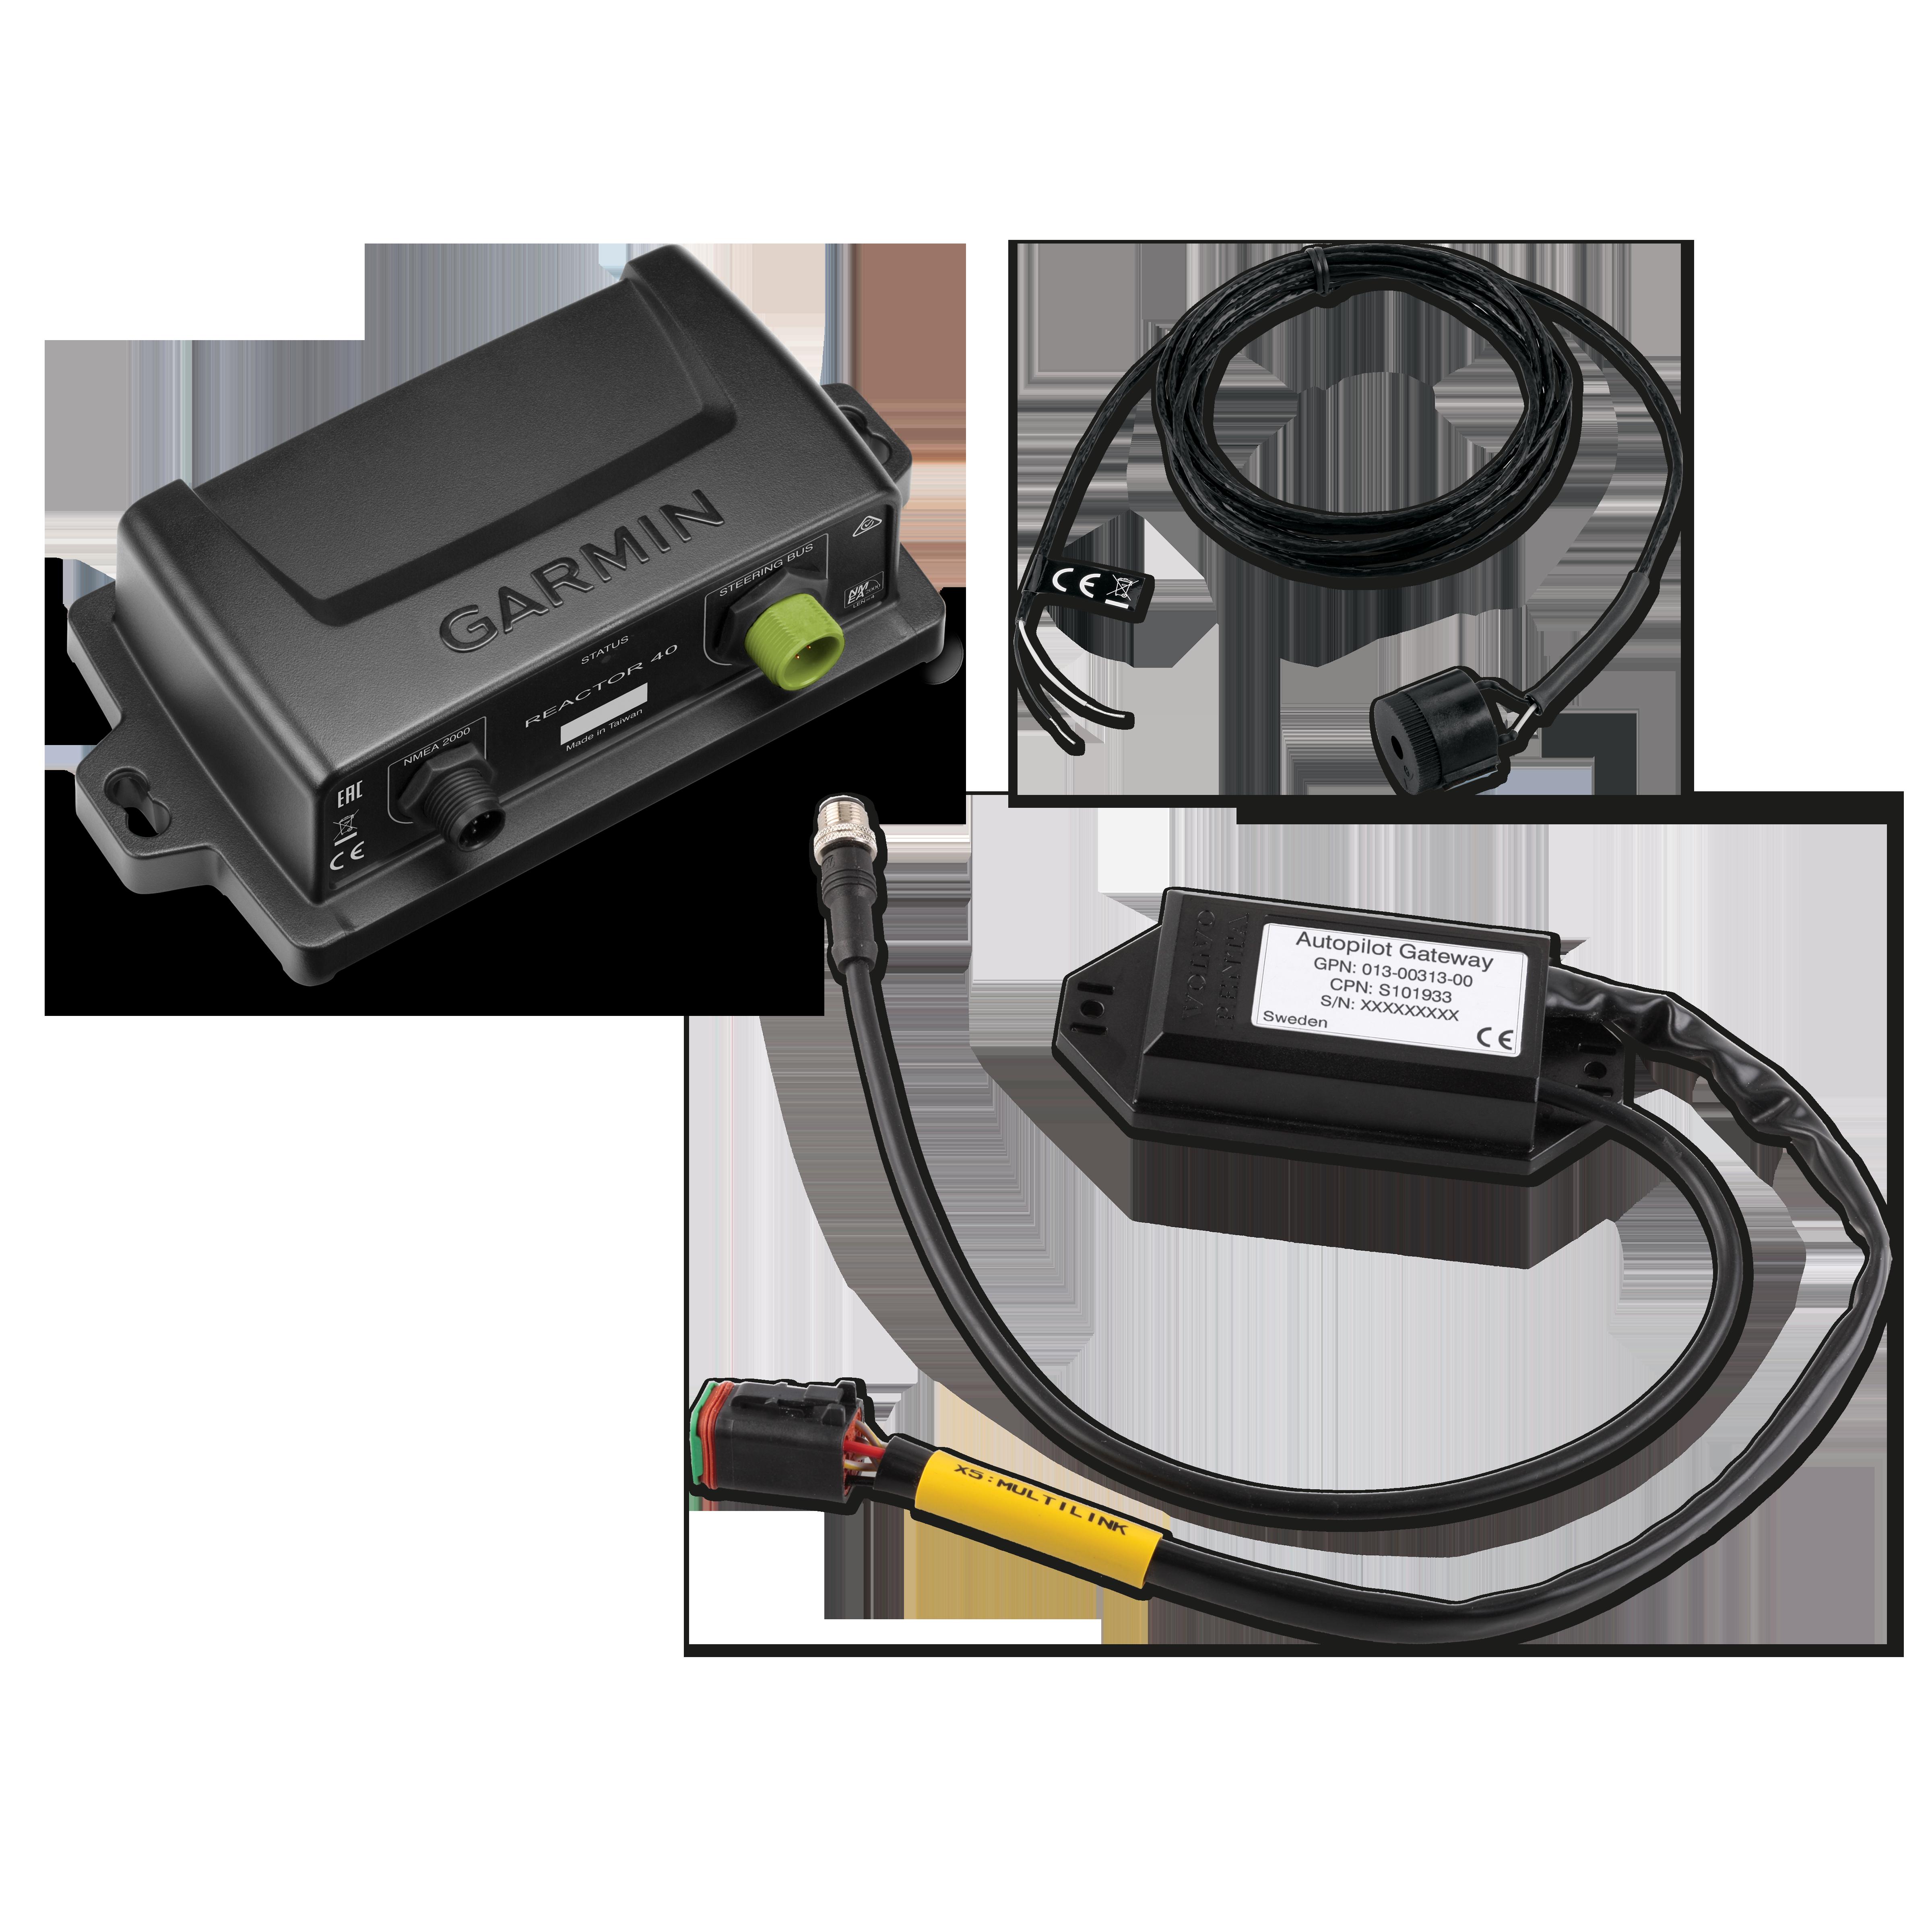 Garmin Reactor 40 Steer By Wire For Volvo Penta 2000 Wiring Diagram Autopilot